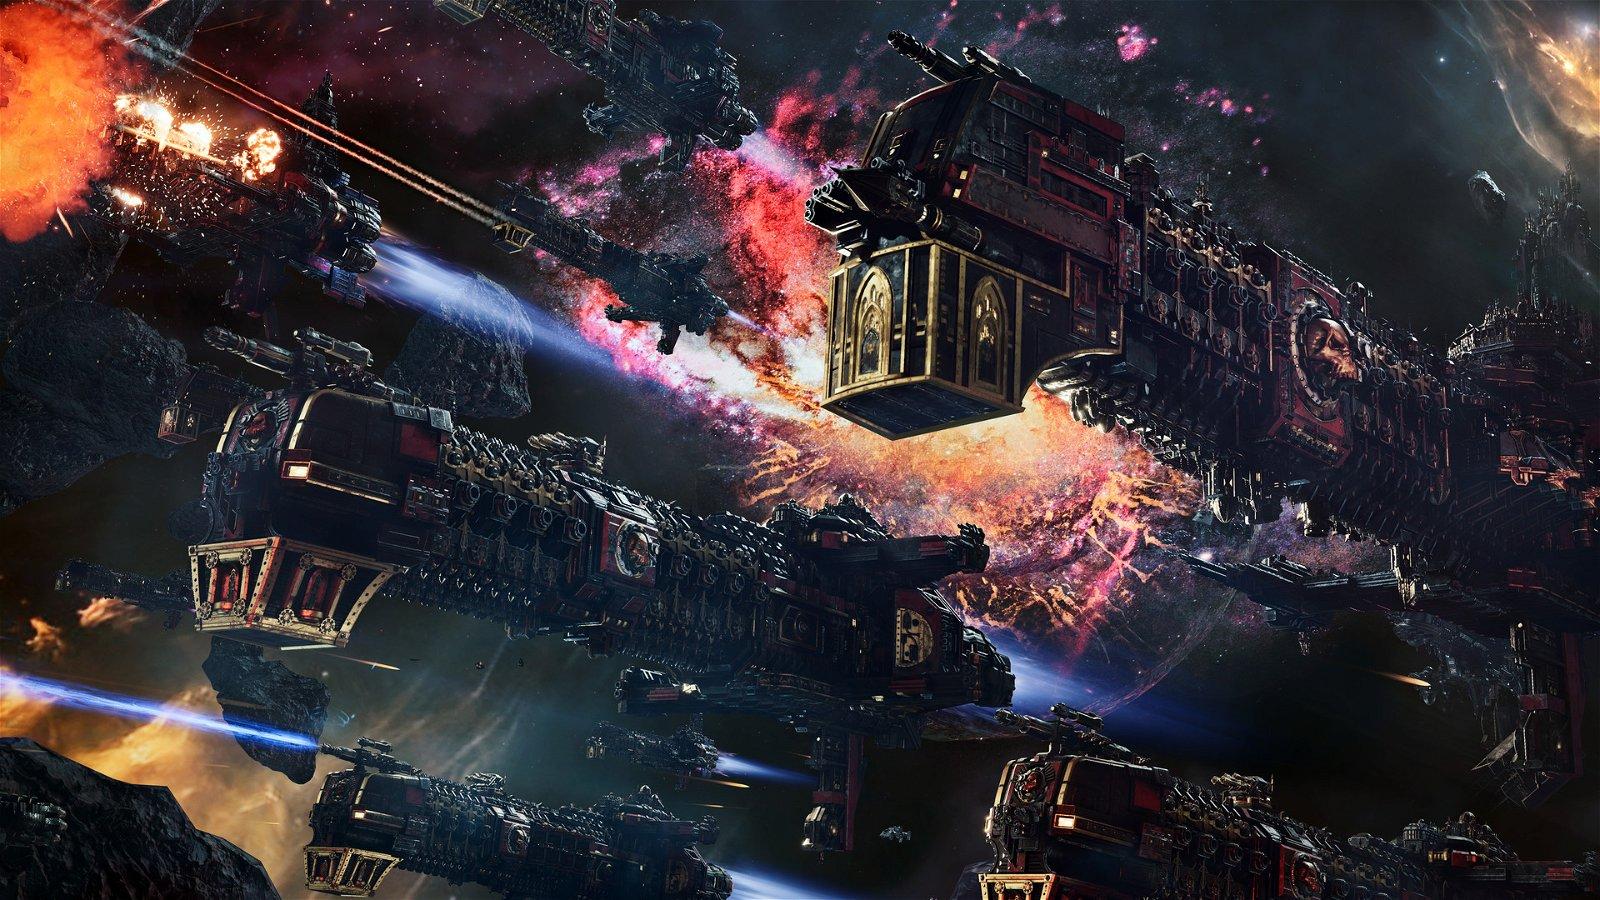 Battlefleet Gothic: Armada 2 (PC) Review 5